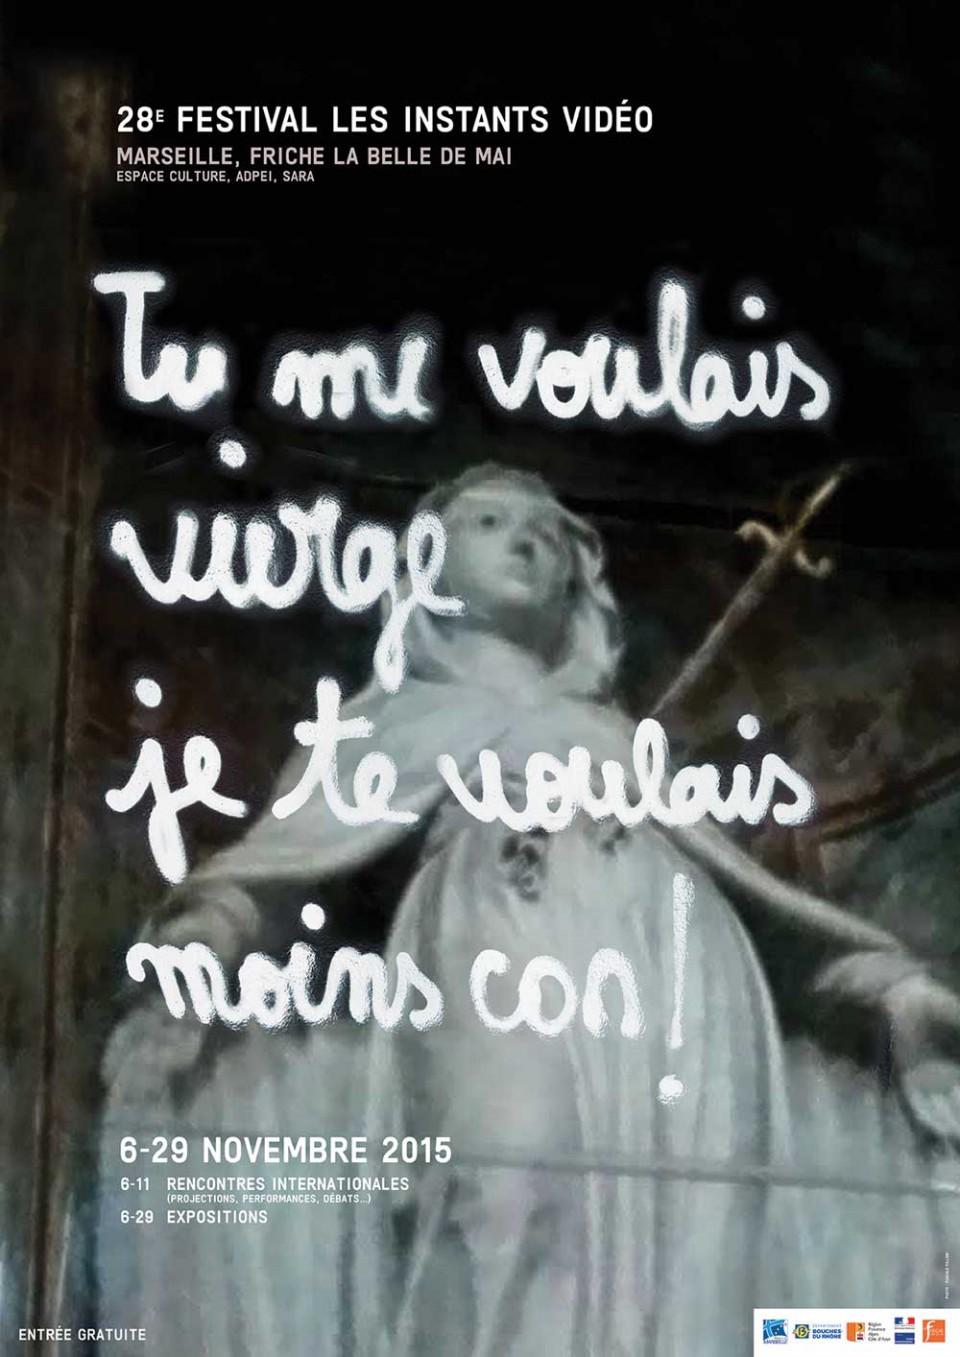 28 Festival Les Instants Vidéo – (M)edito